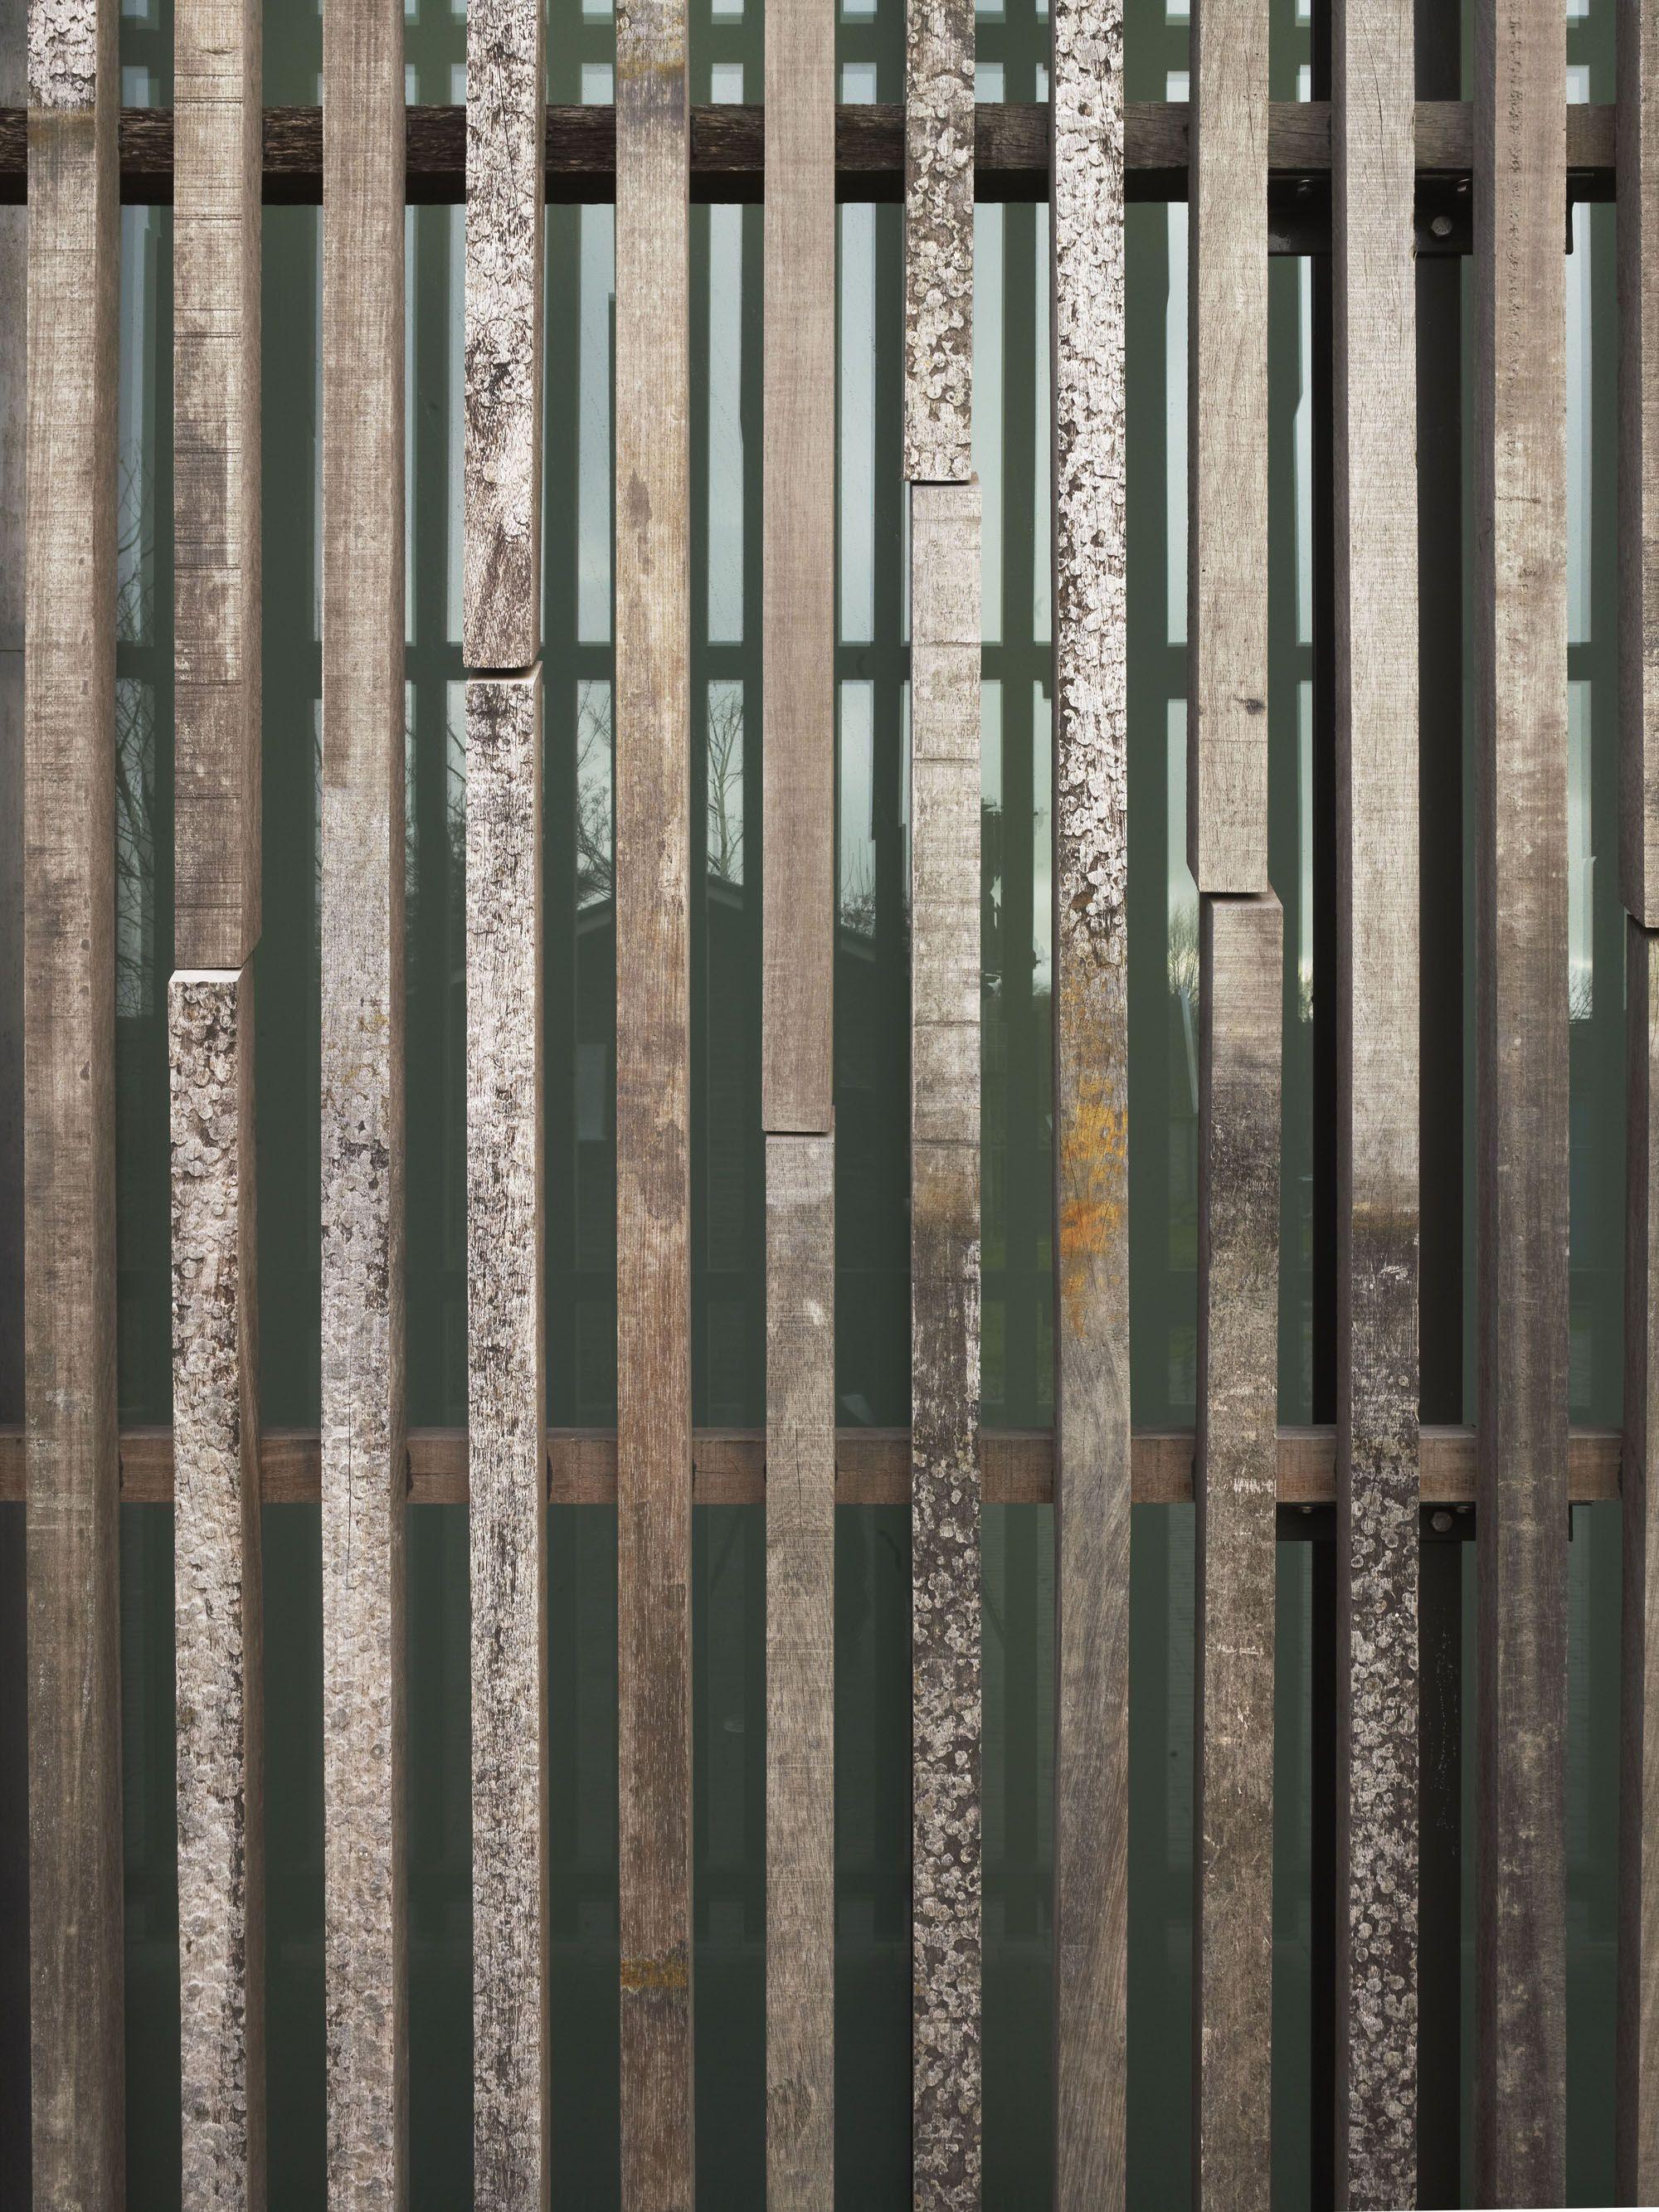 Glass Screening Timber Screen Timber Slats Vertical